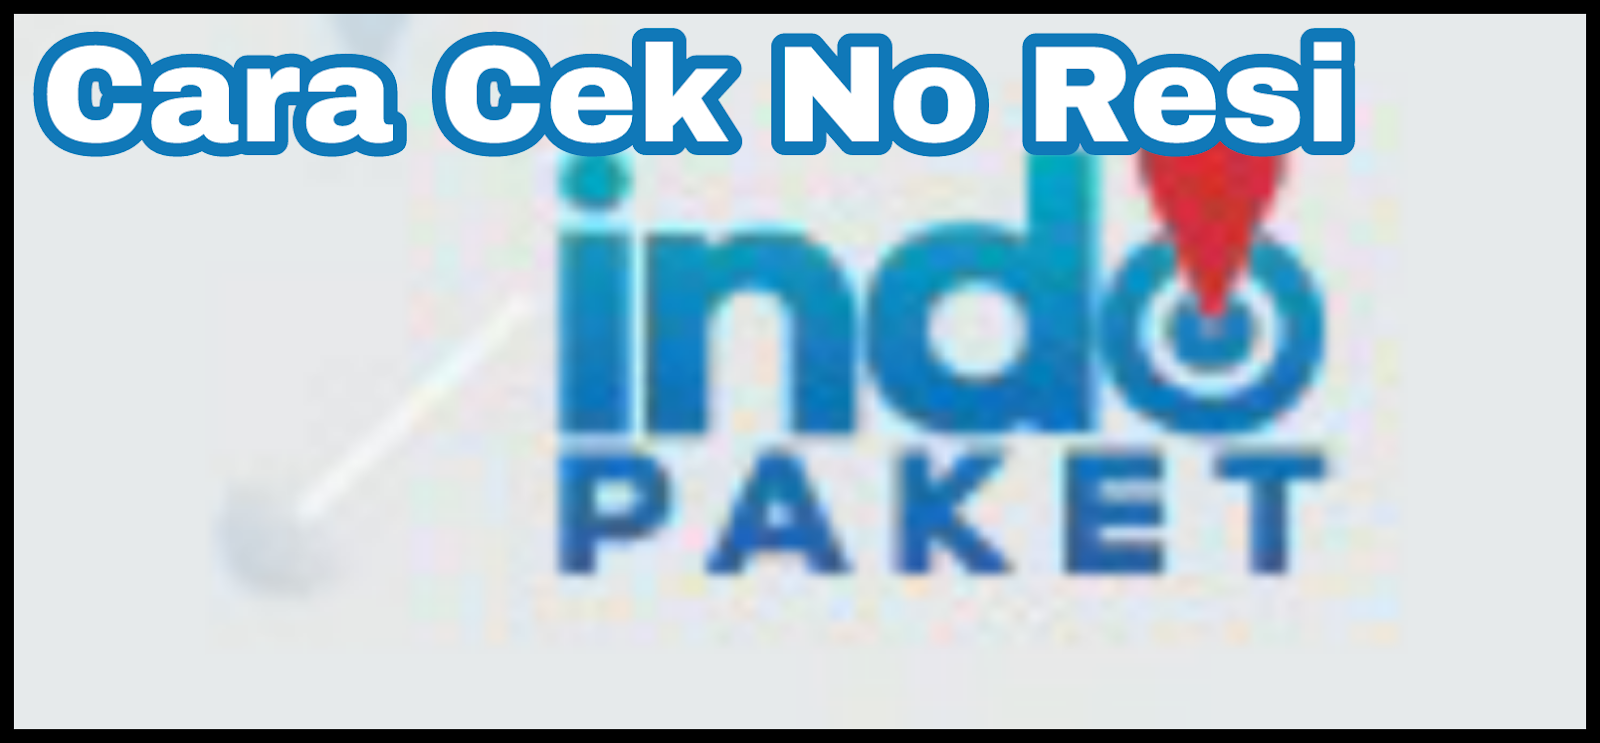 Tukulcye Exclusive Voucher Indomaret 7 Pcs Cara Cek No Resi Di Indopaket